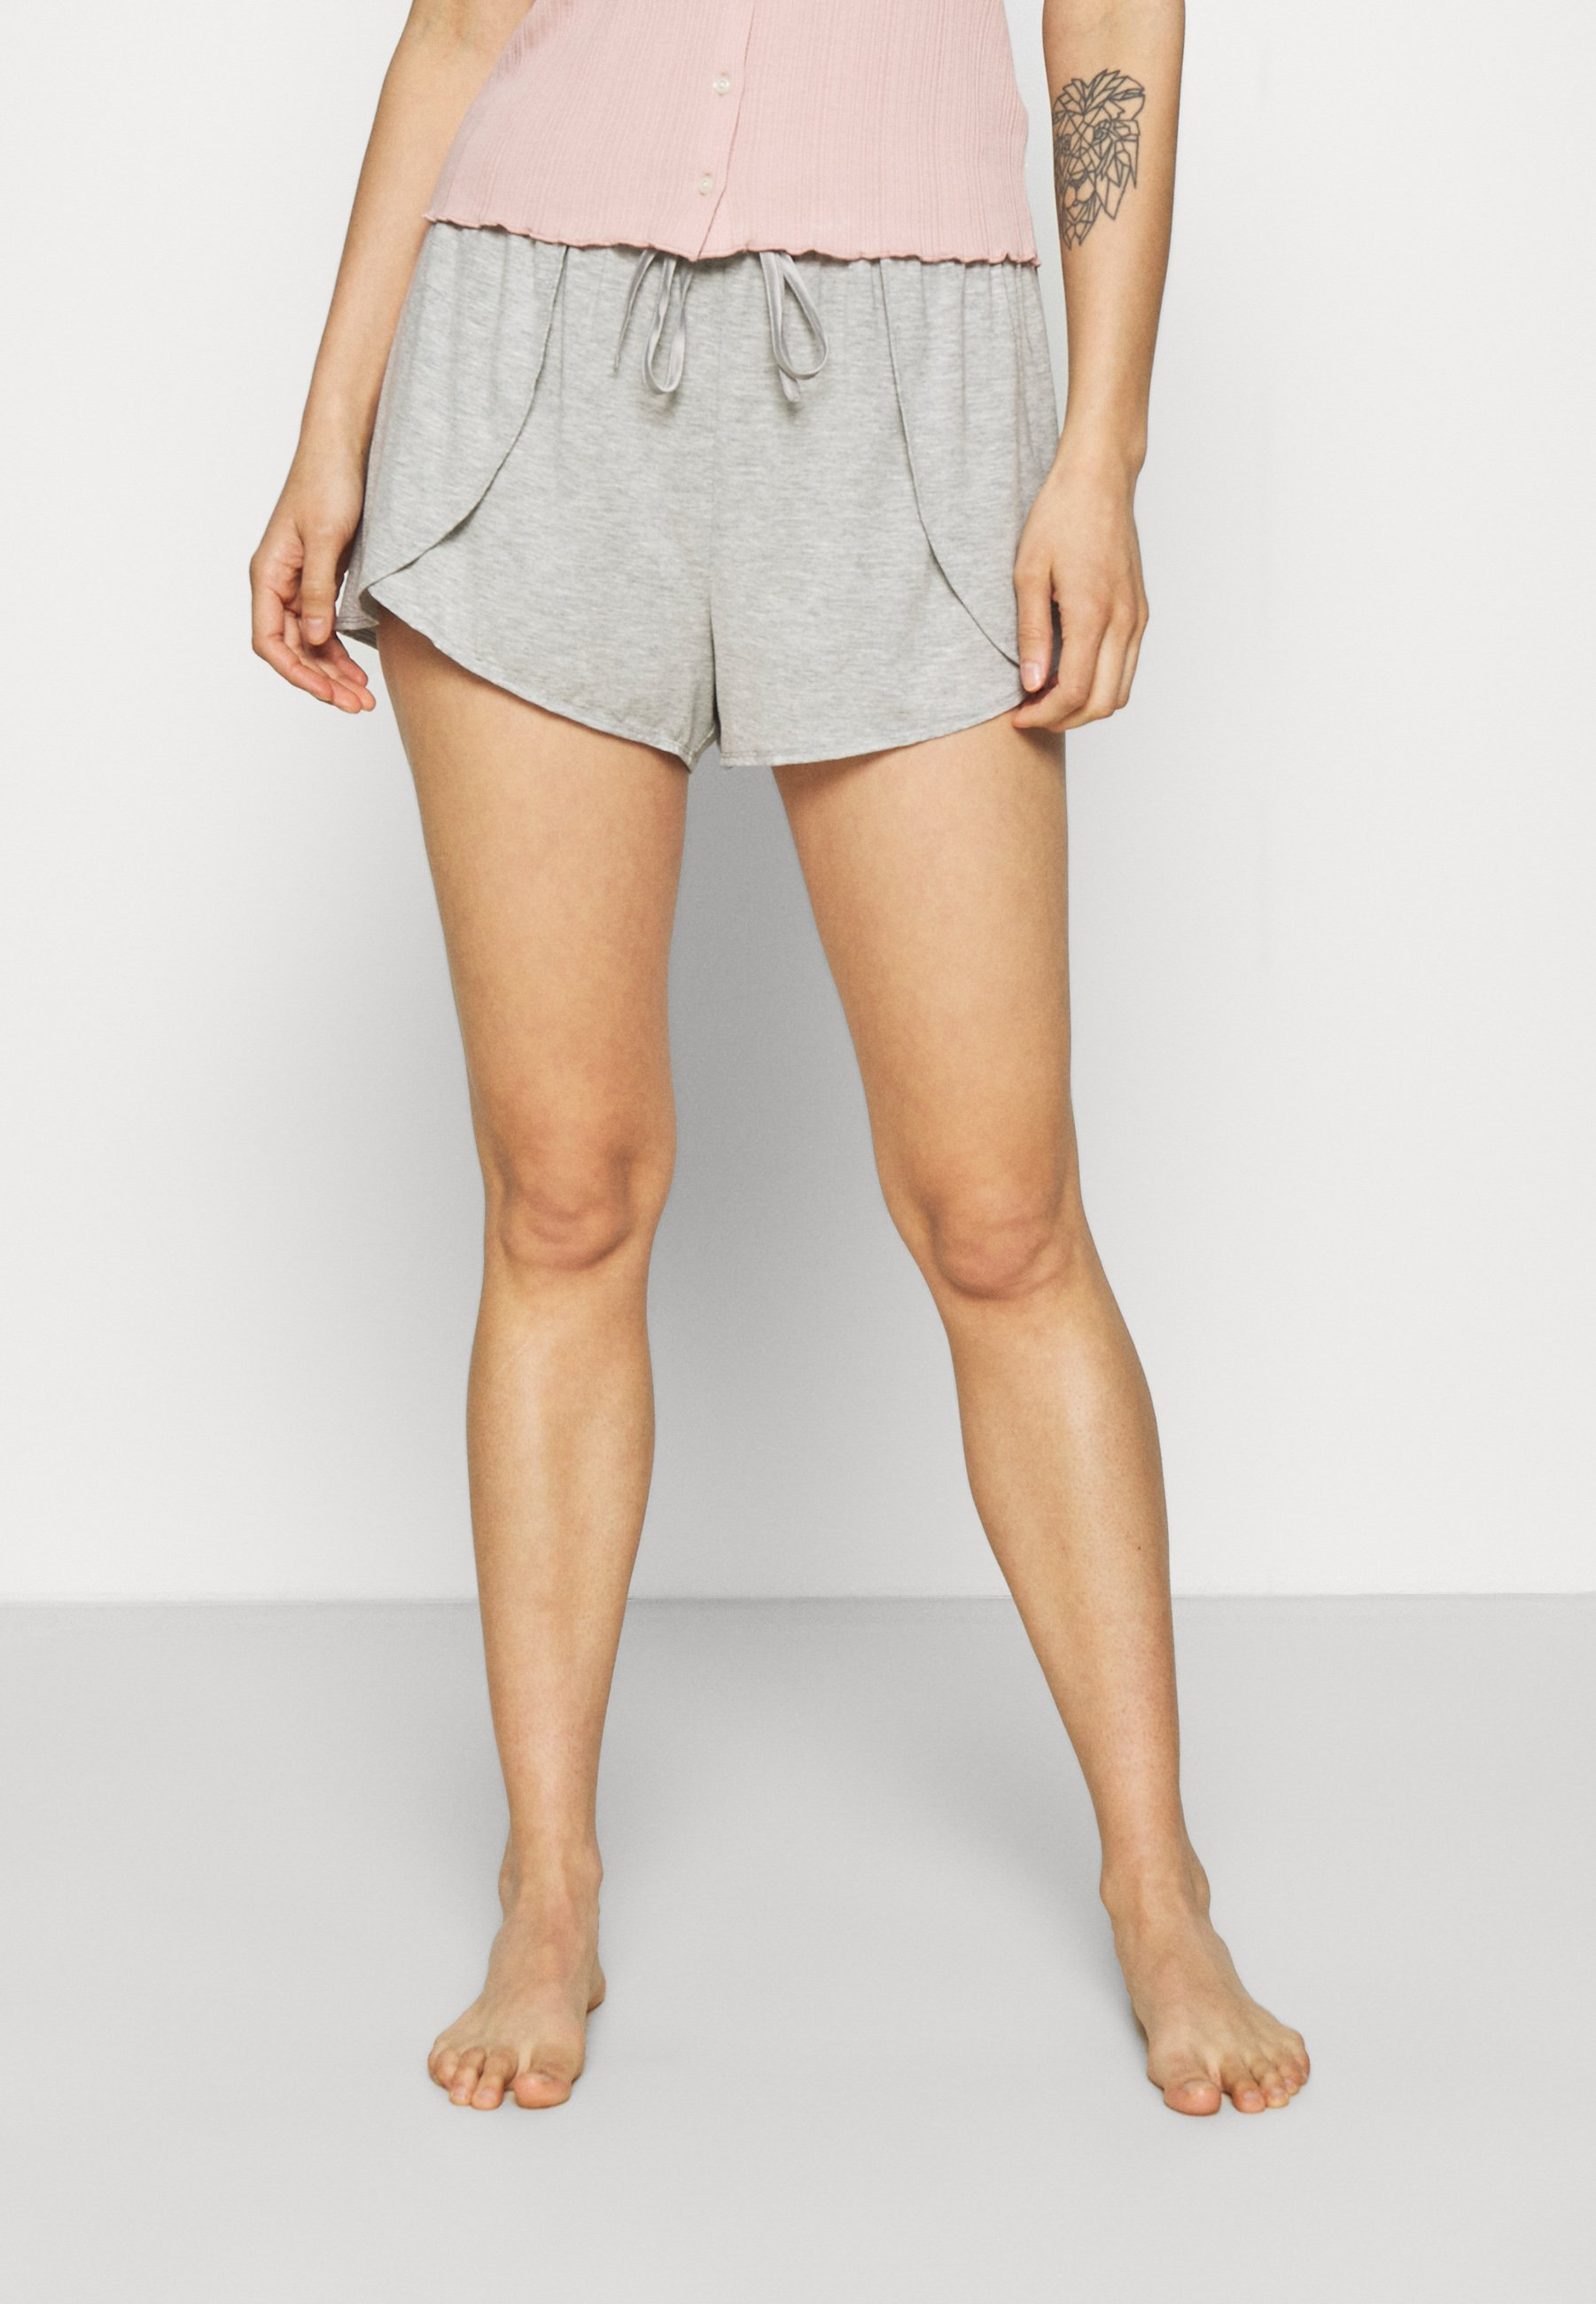 Donna TULIP - Pantaloni del pigiama